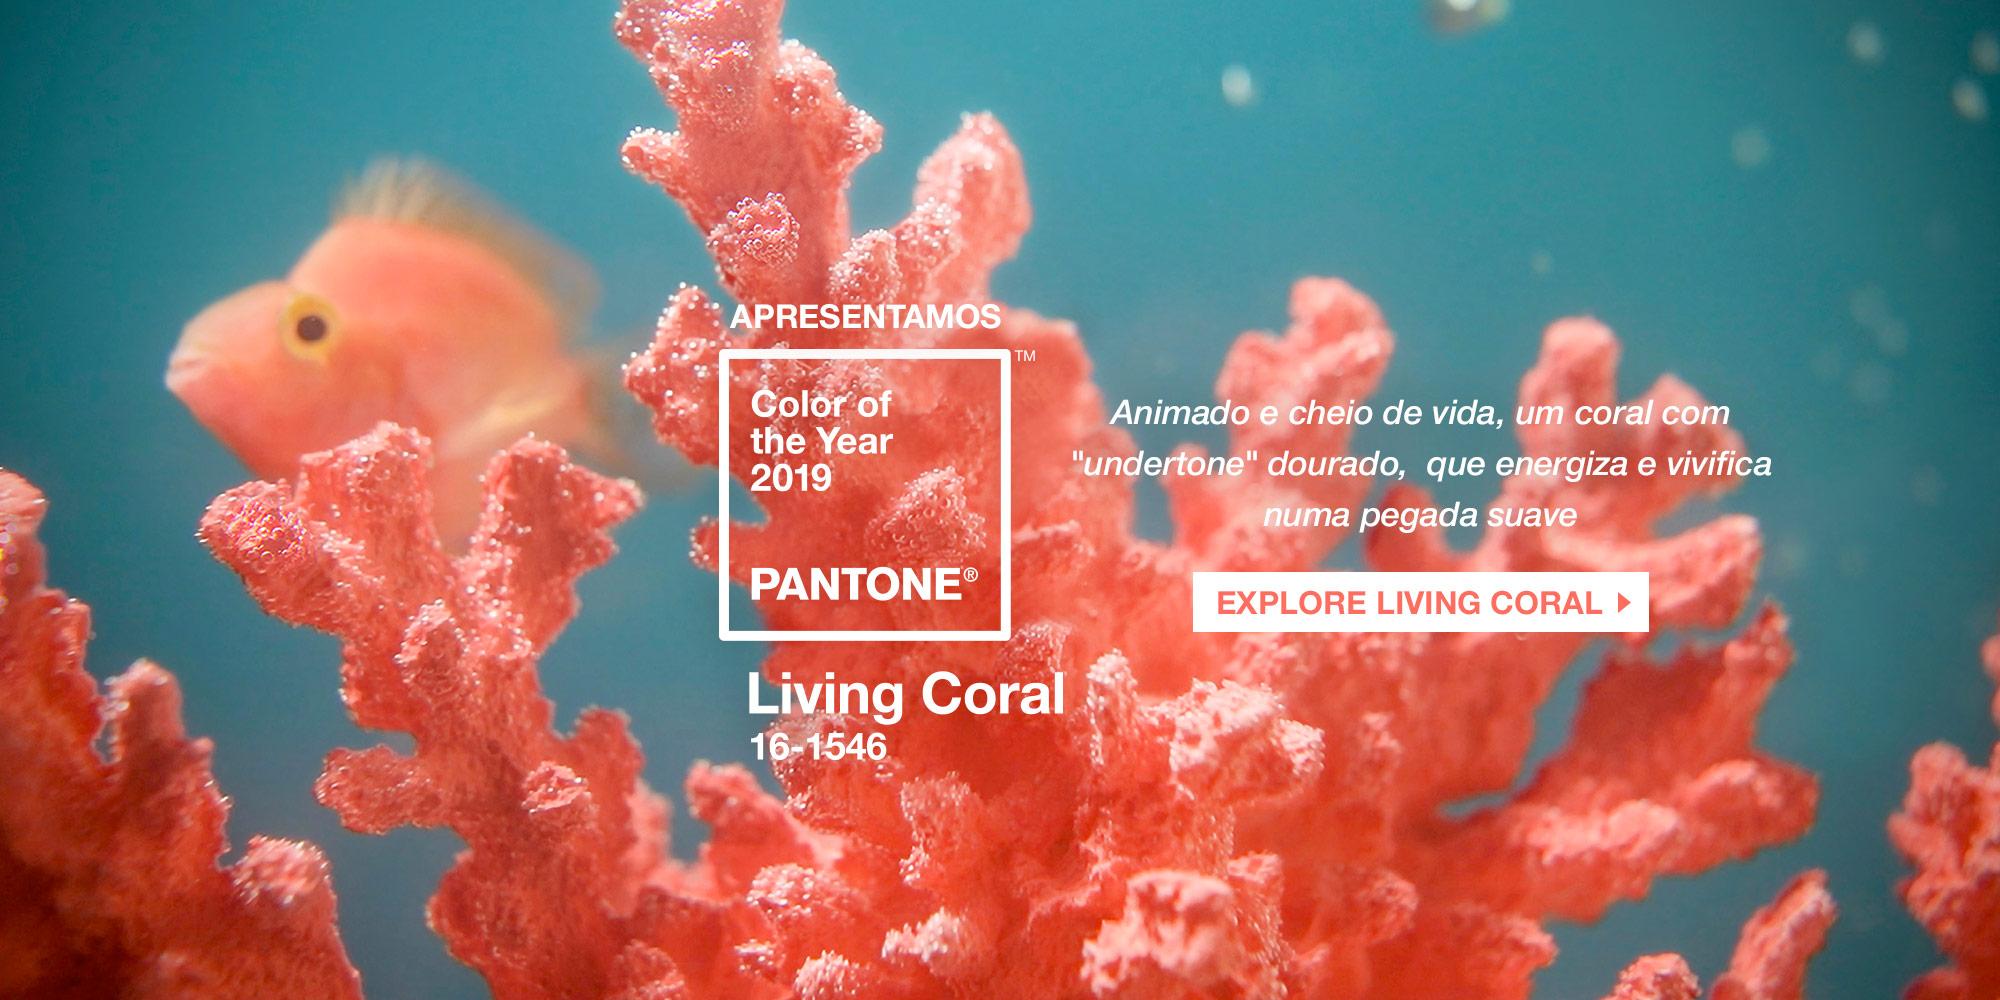 Cor do Ano 2019 - Living Coral - Pantone